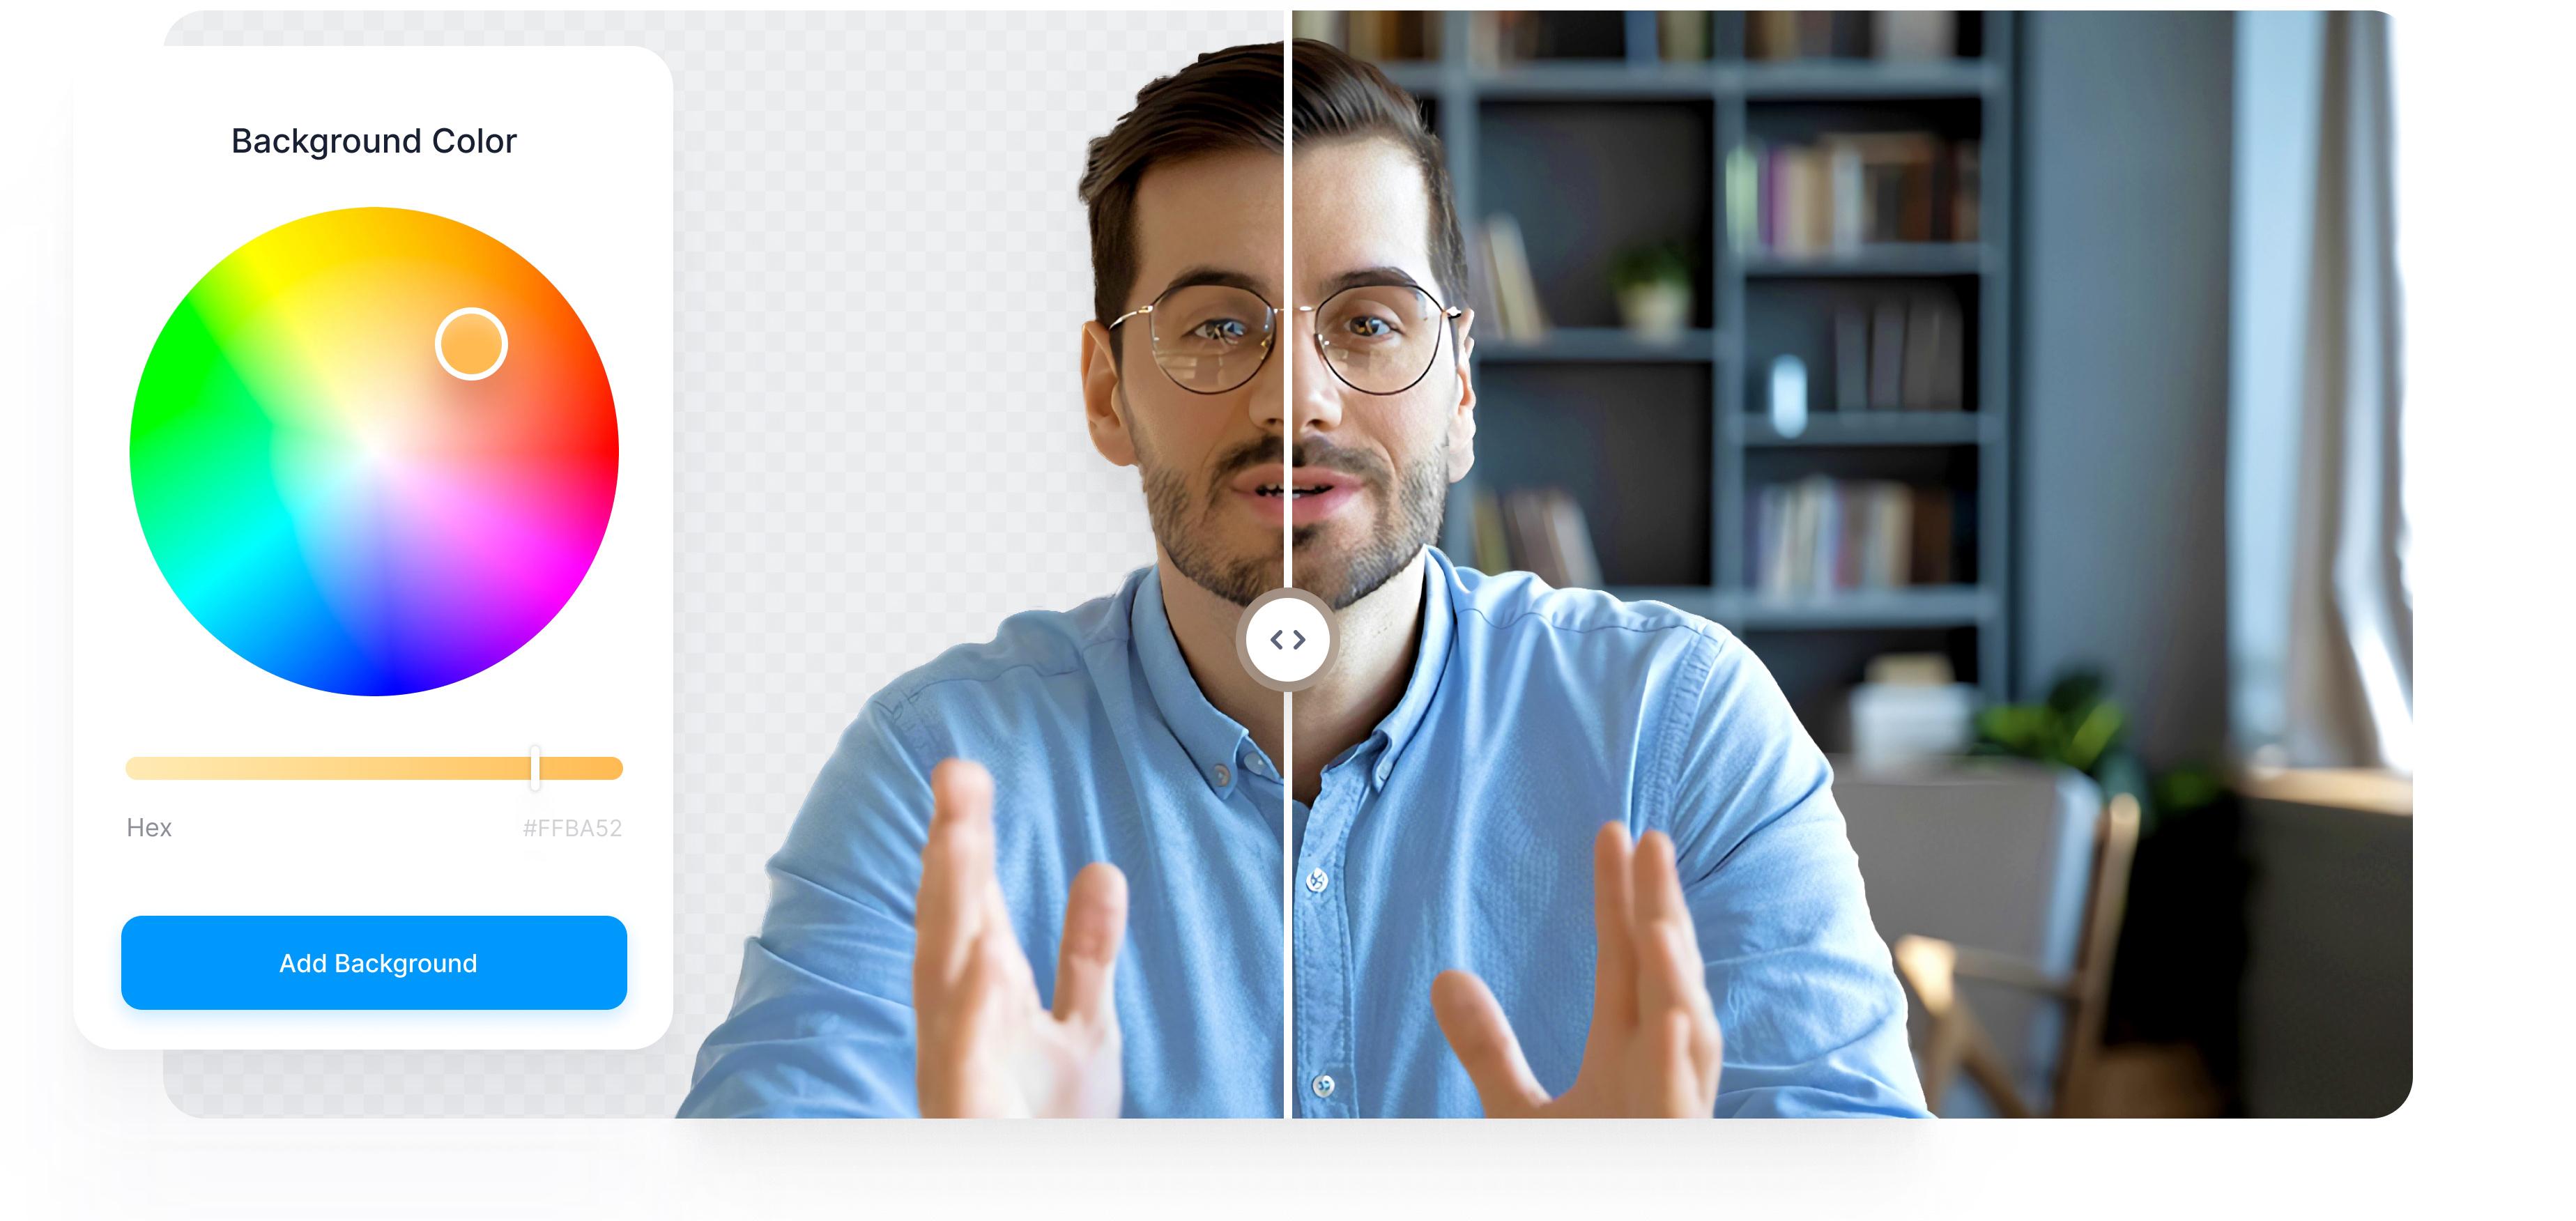 Webcam Remove Background